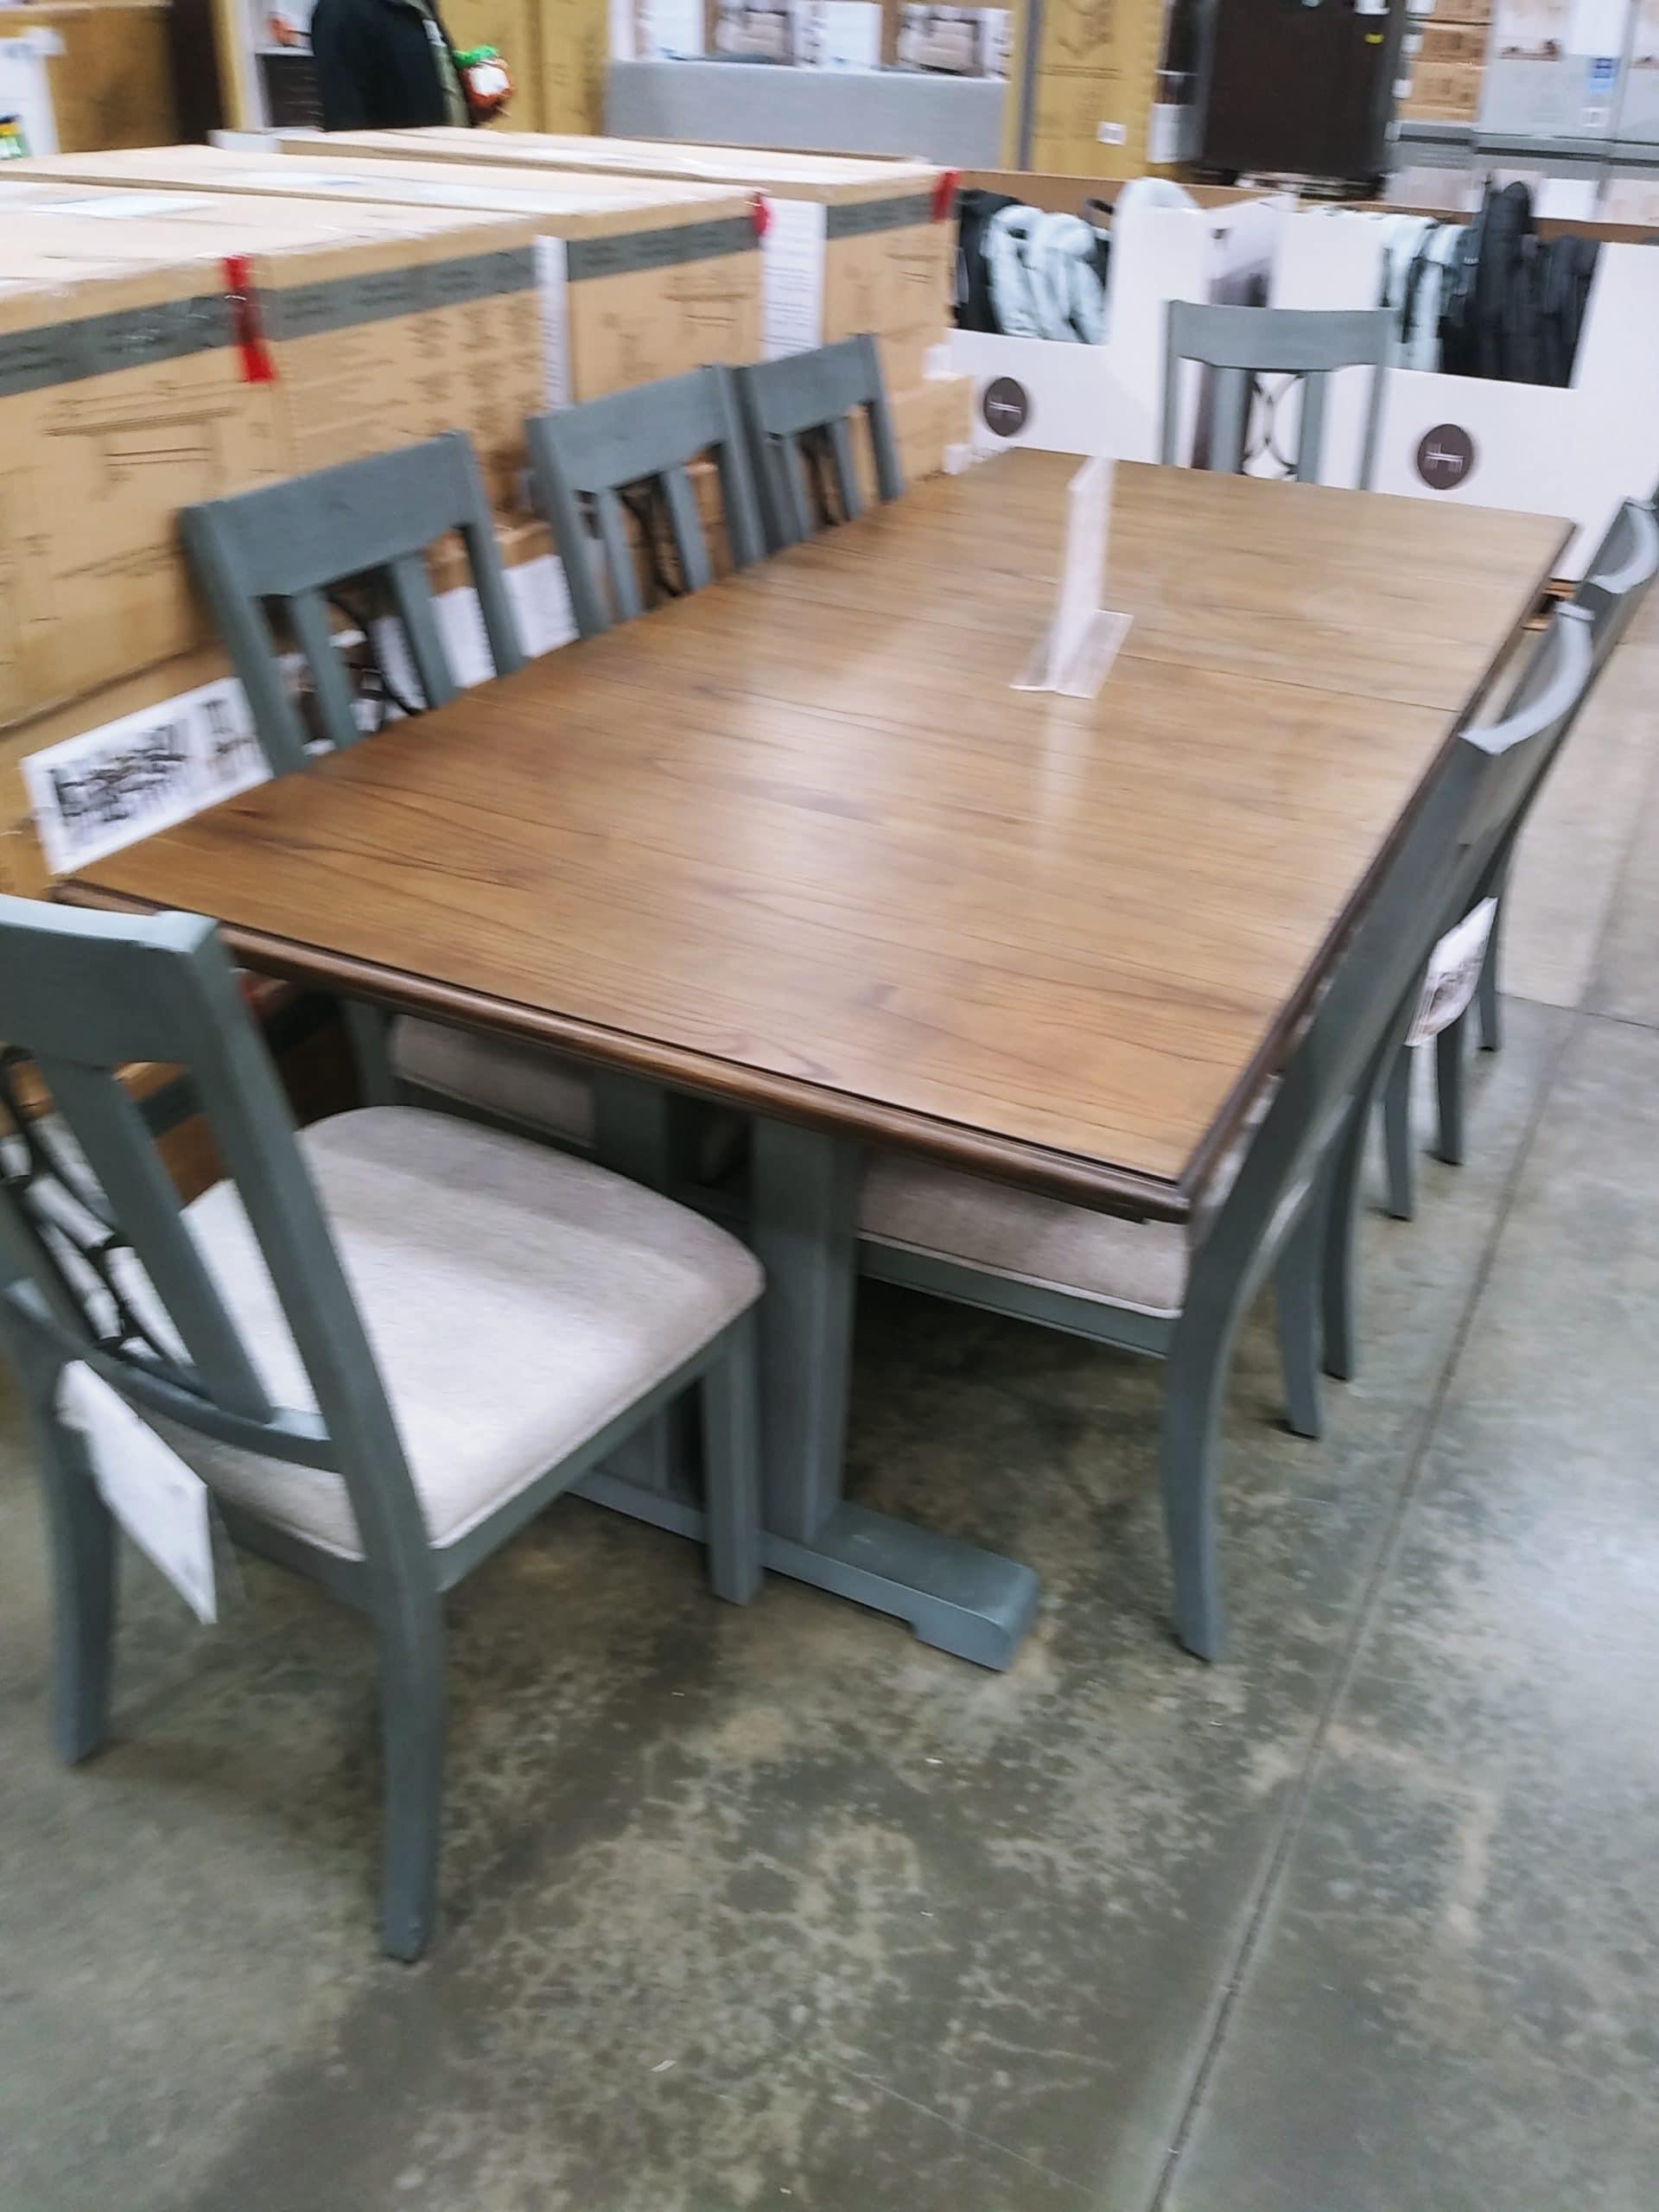 Northridge Home Vega 9pc Dining Room Table Set $799